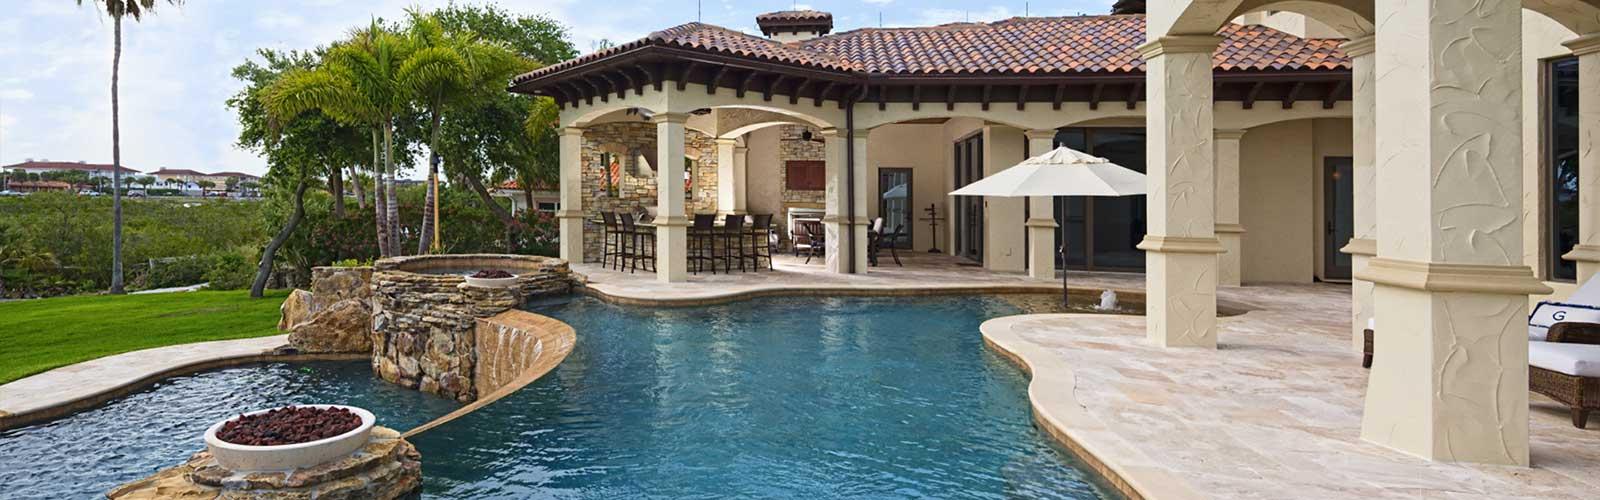 img bg title pool 1600 500. Black Bedroom Furniture Sets. Home Design Ideas